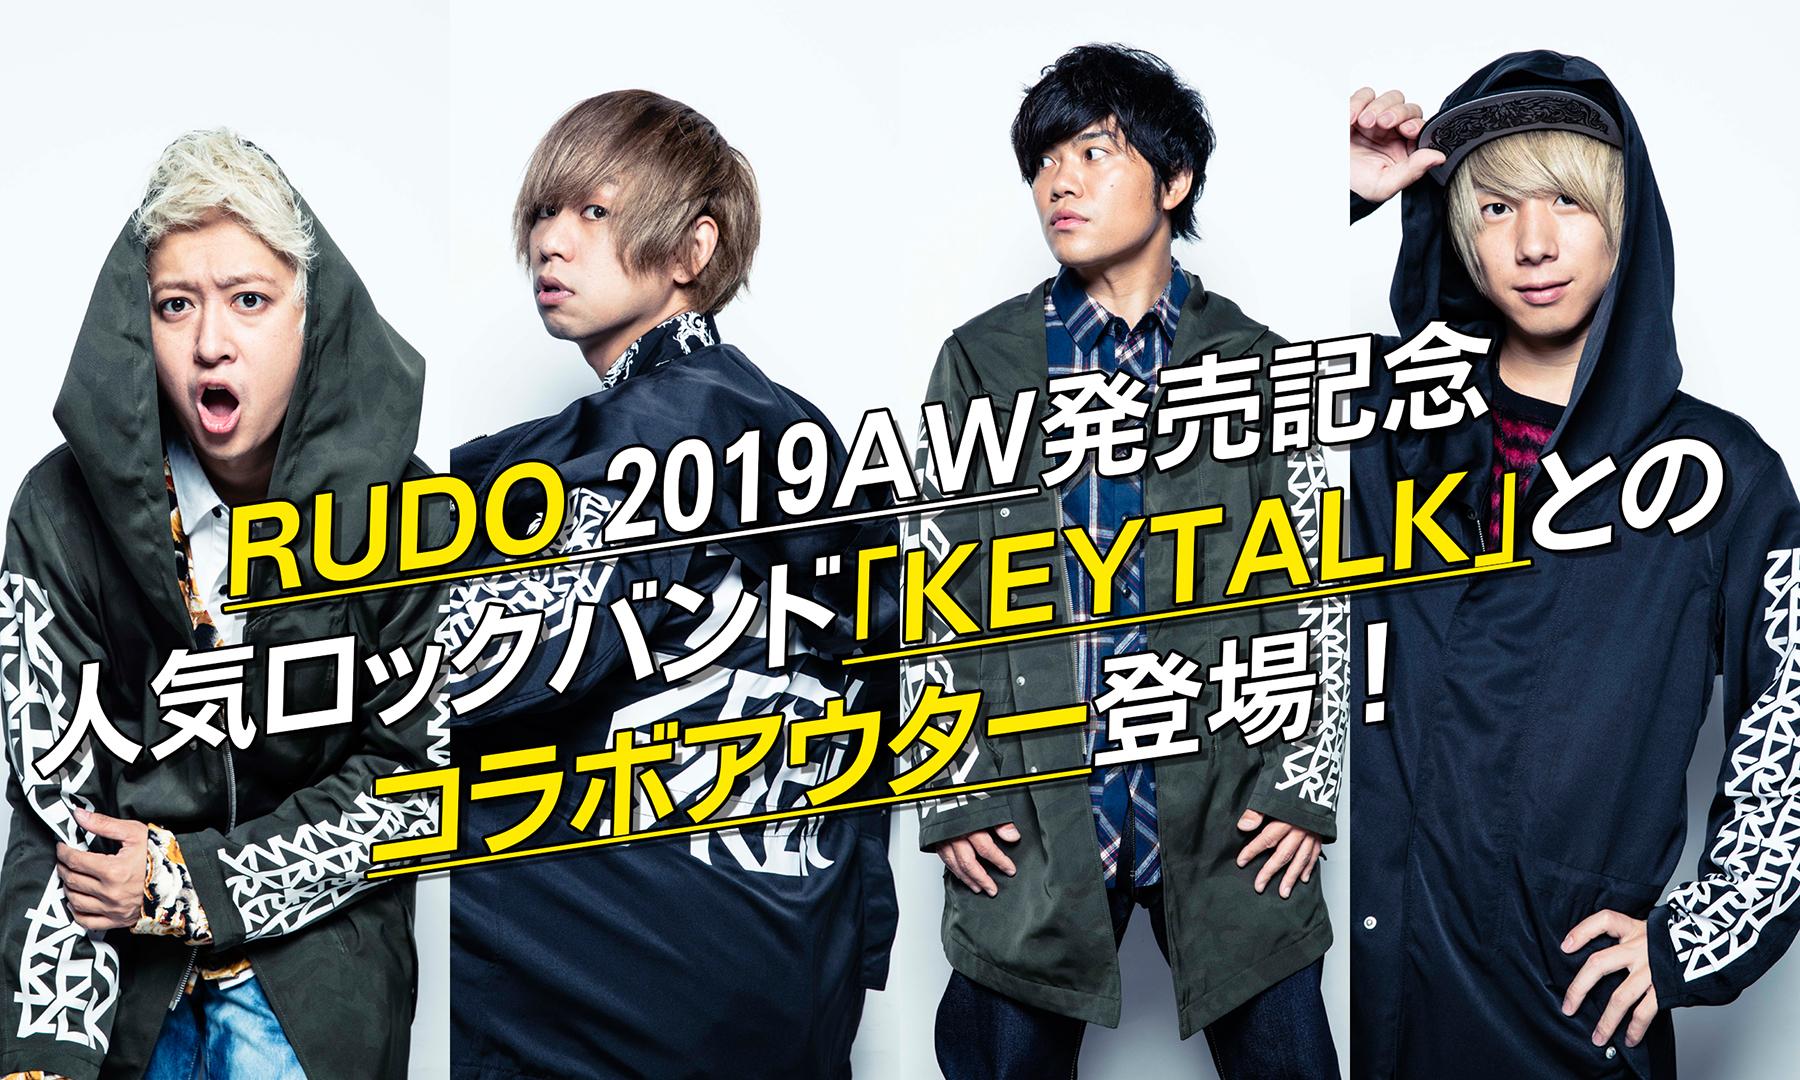 RUDO 2019AW発売記念・人気ロックバンド「KEYTALK」とのコラボアウター登場!